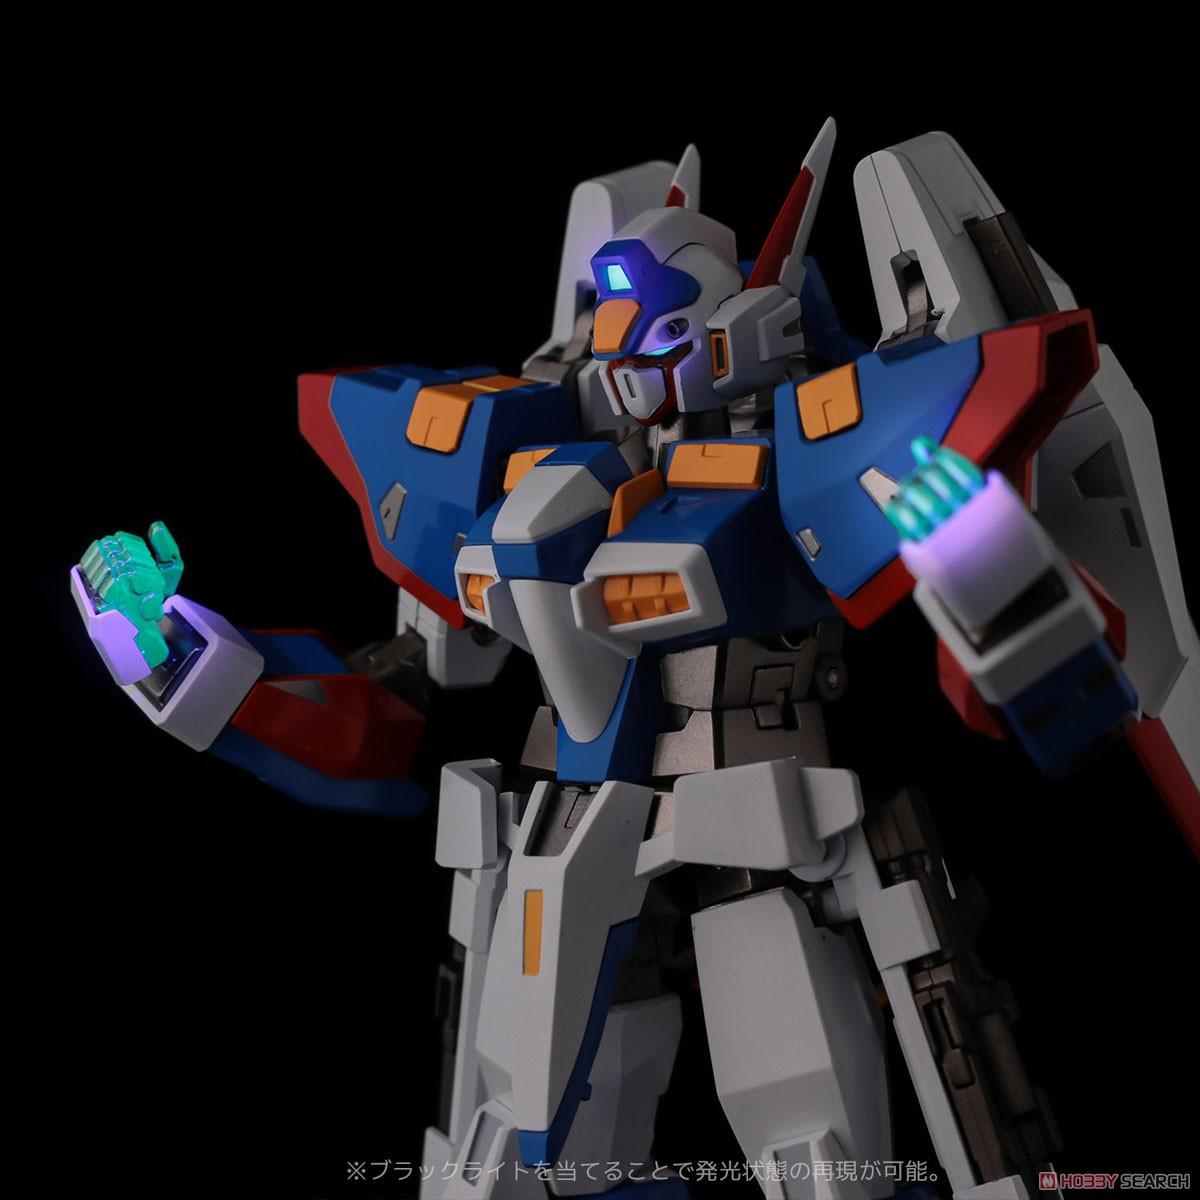 RIOBOT『変形合体 R-1』スーパーロボット大戦OG 可変合体フィギュア-012